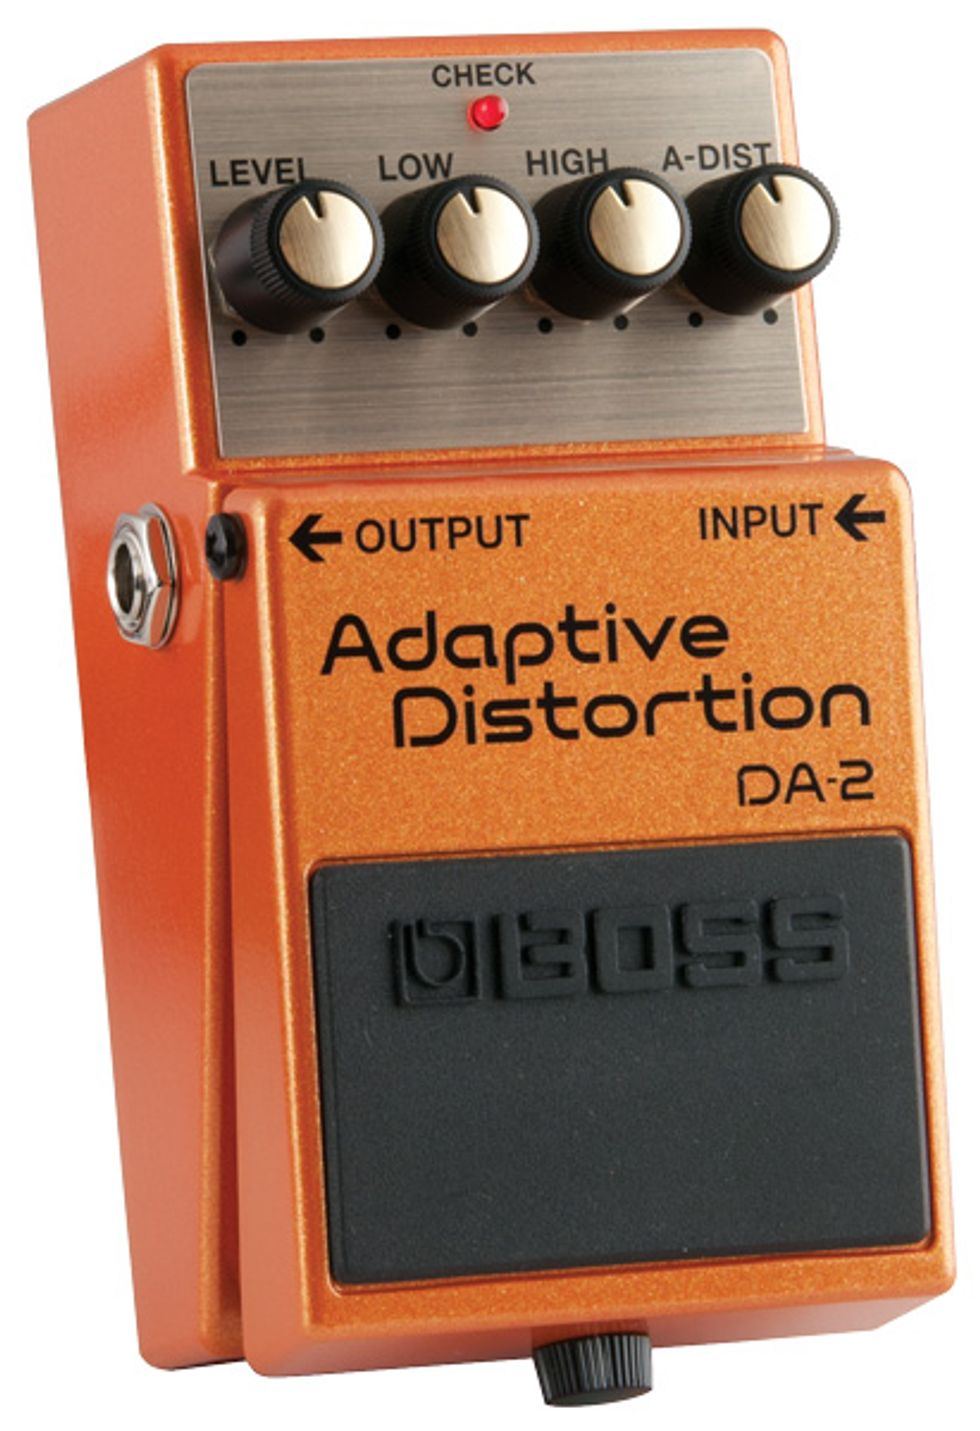 Boss DA-2 Adaptive Distortion Review | 2013-08-29 ...